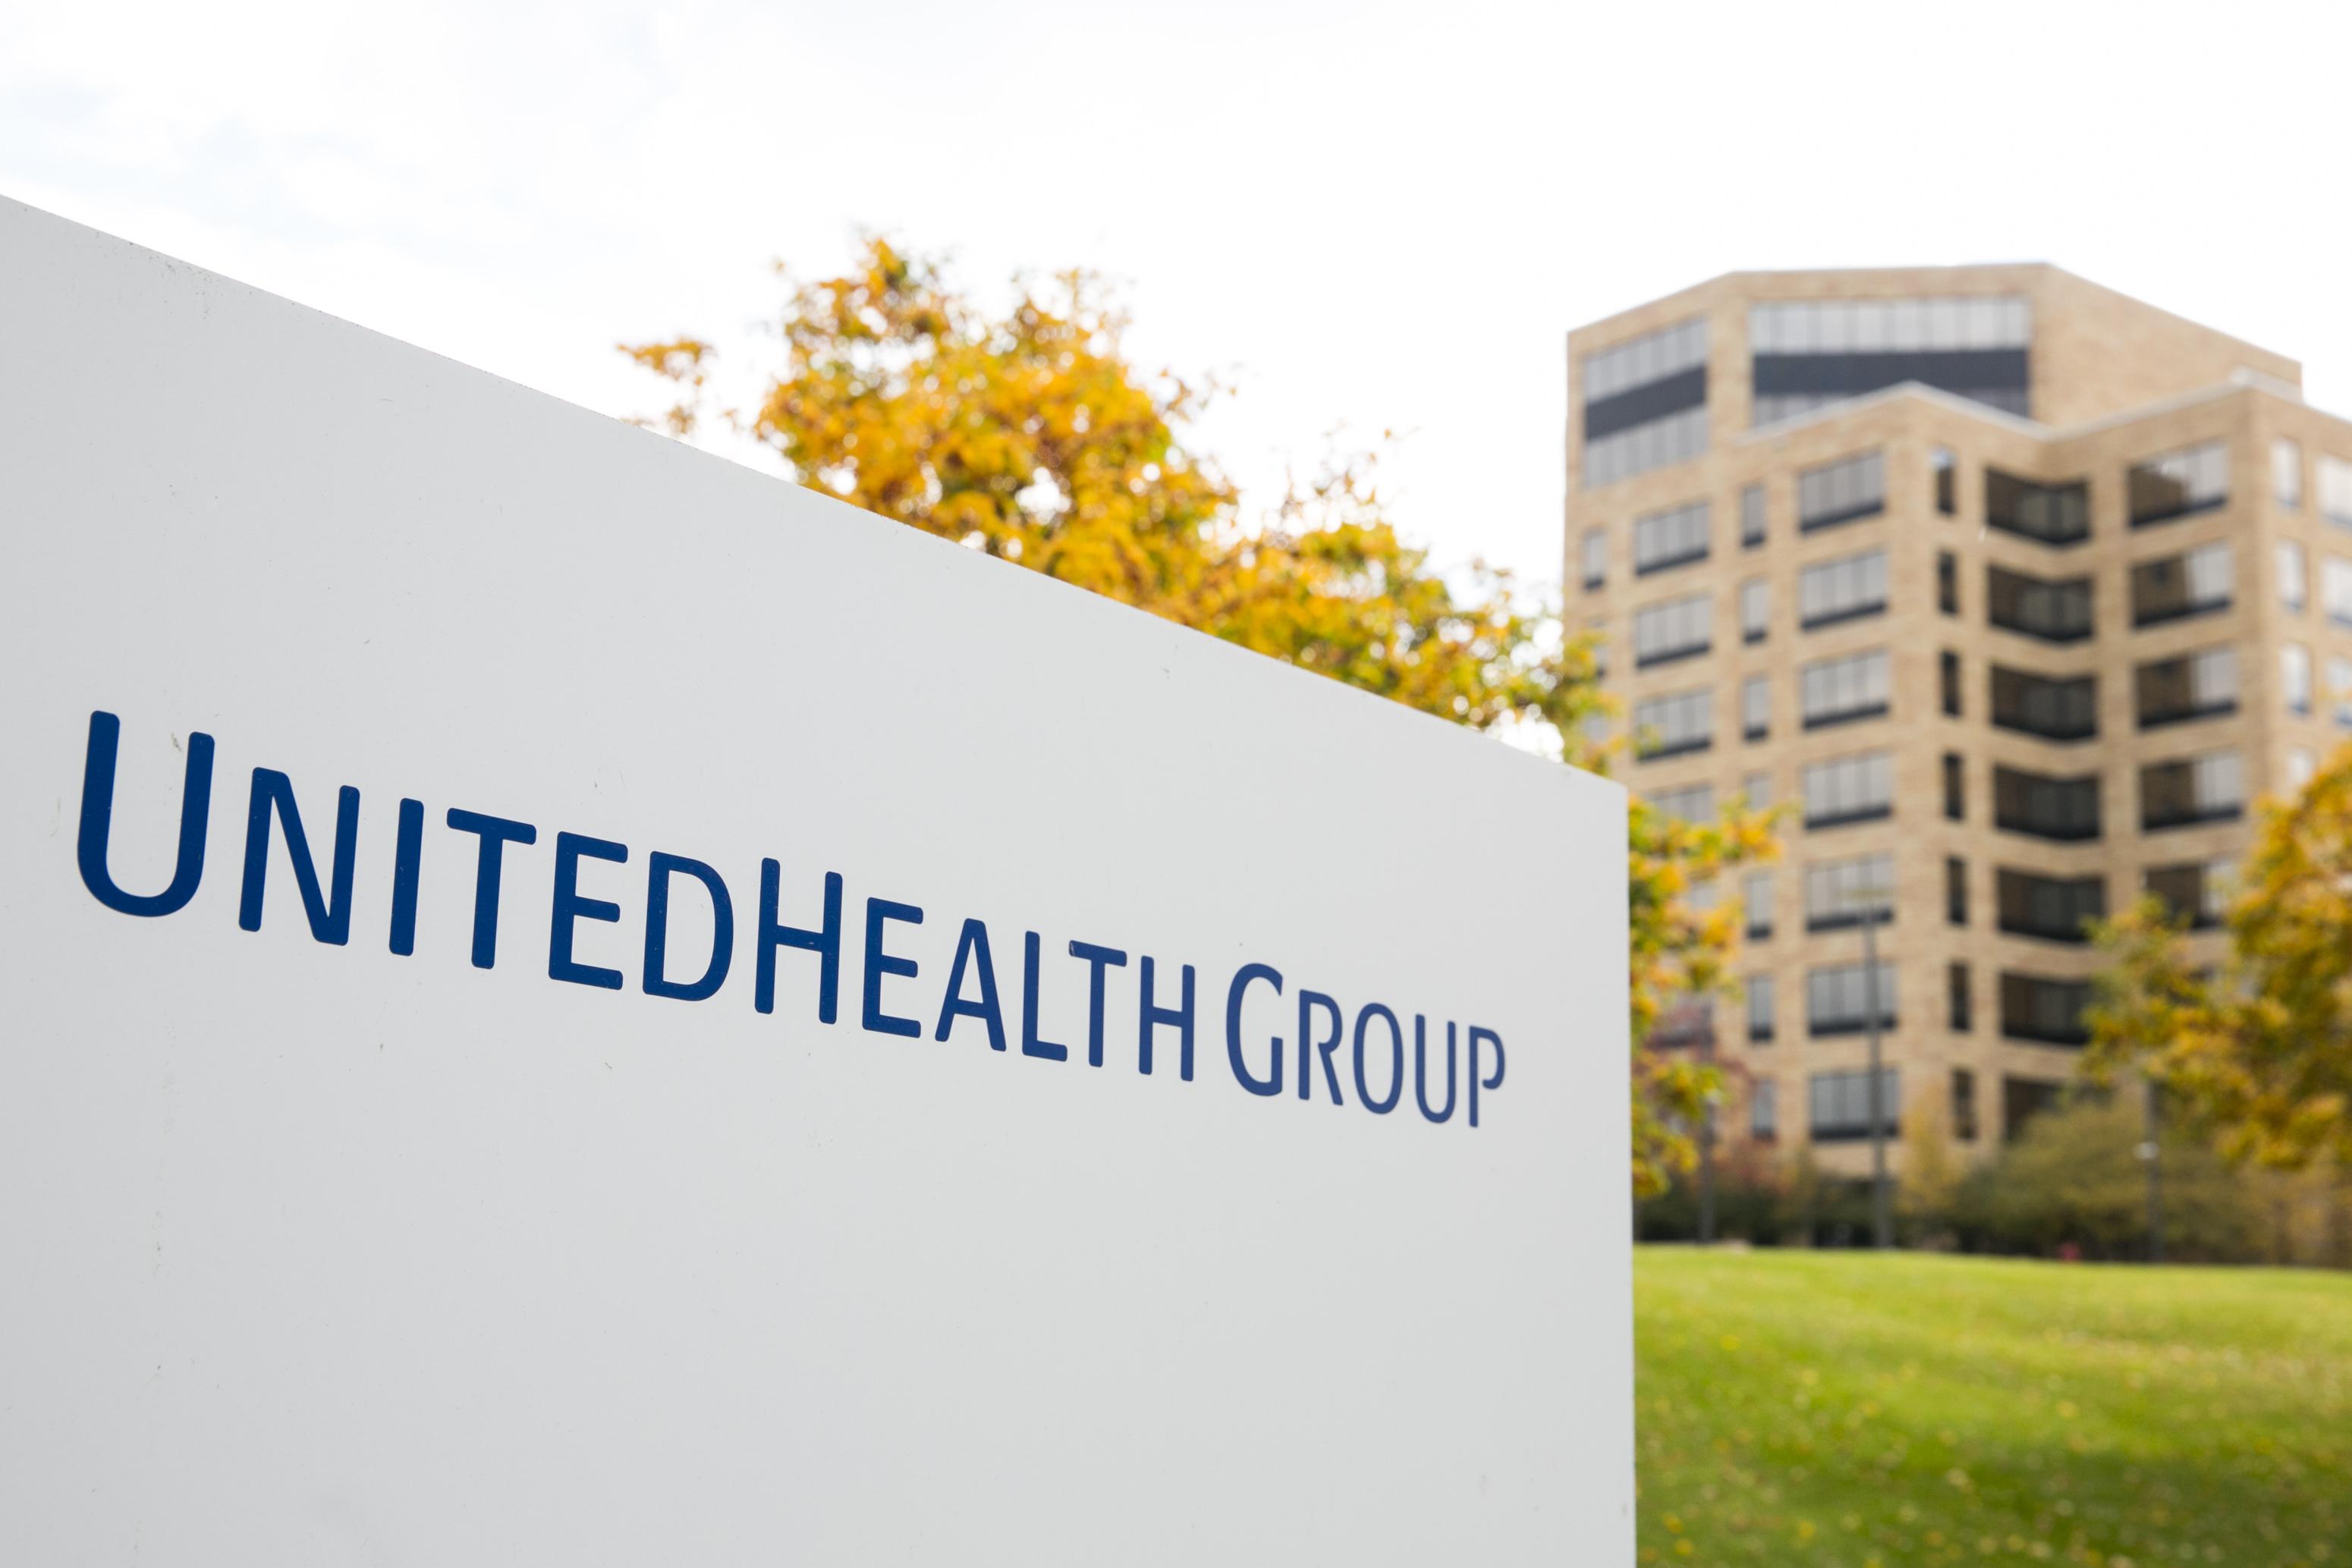 A logo sign outside of the headquarters of UnitedHealth Group in Minnetonka, Minnesota.